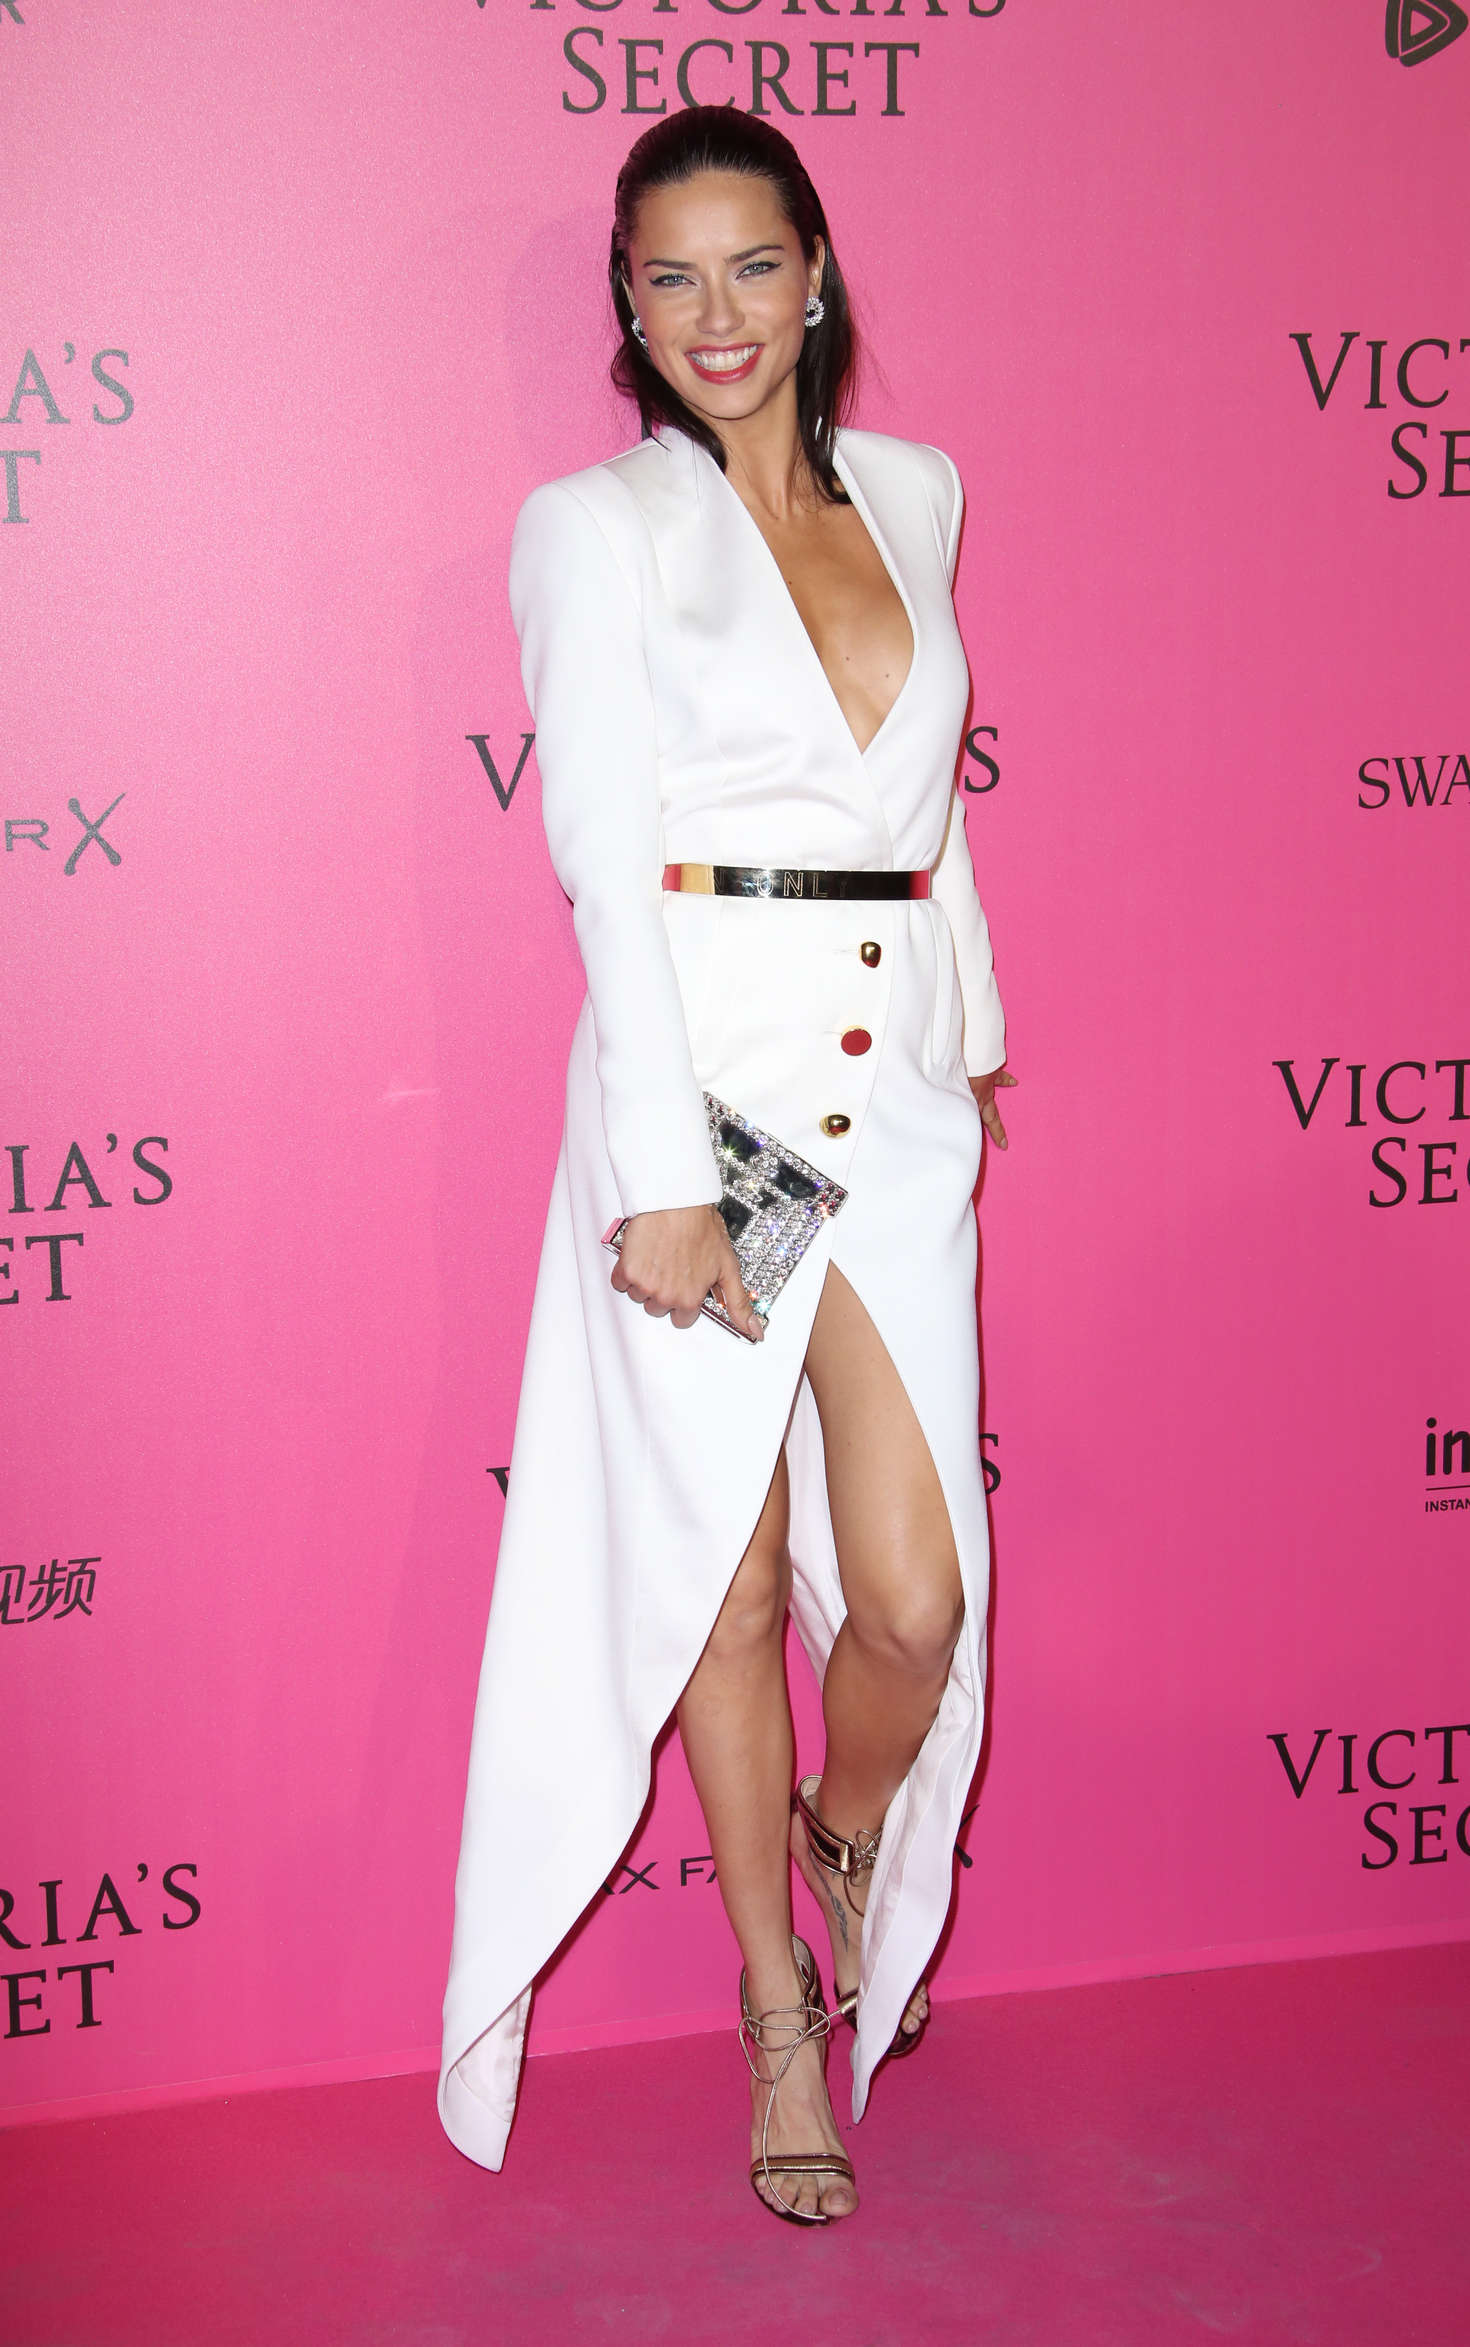 Katy Perry Black Vinyl Dress Arollo Thigh High Boots